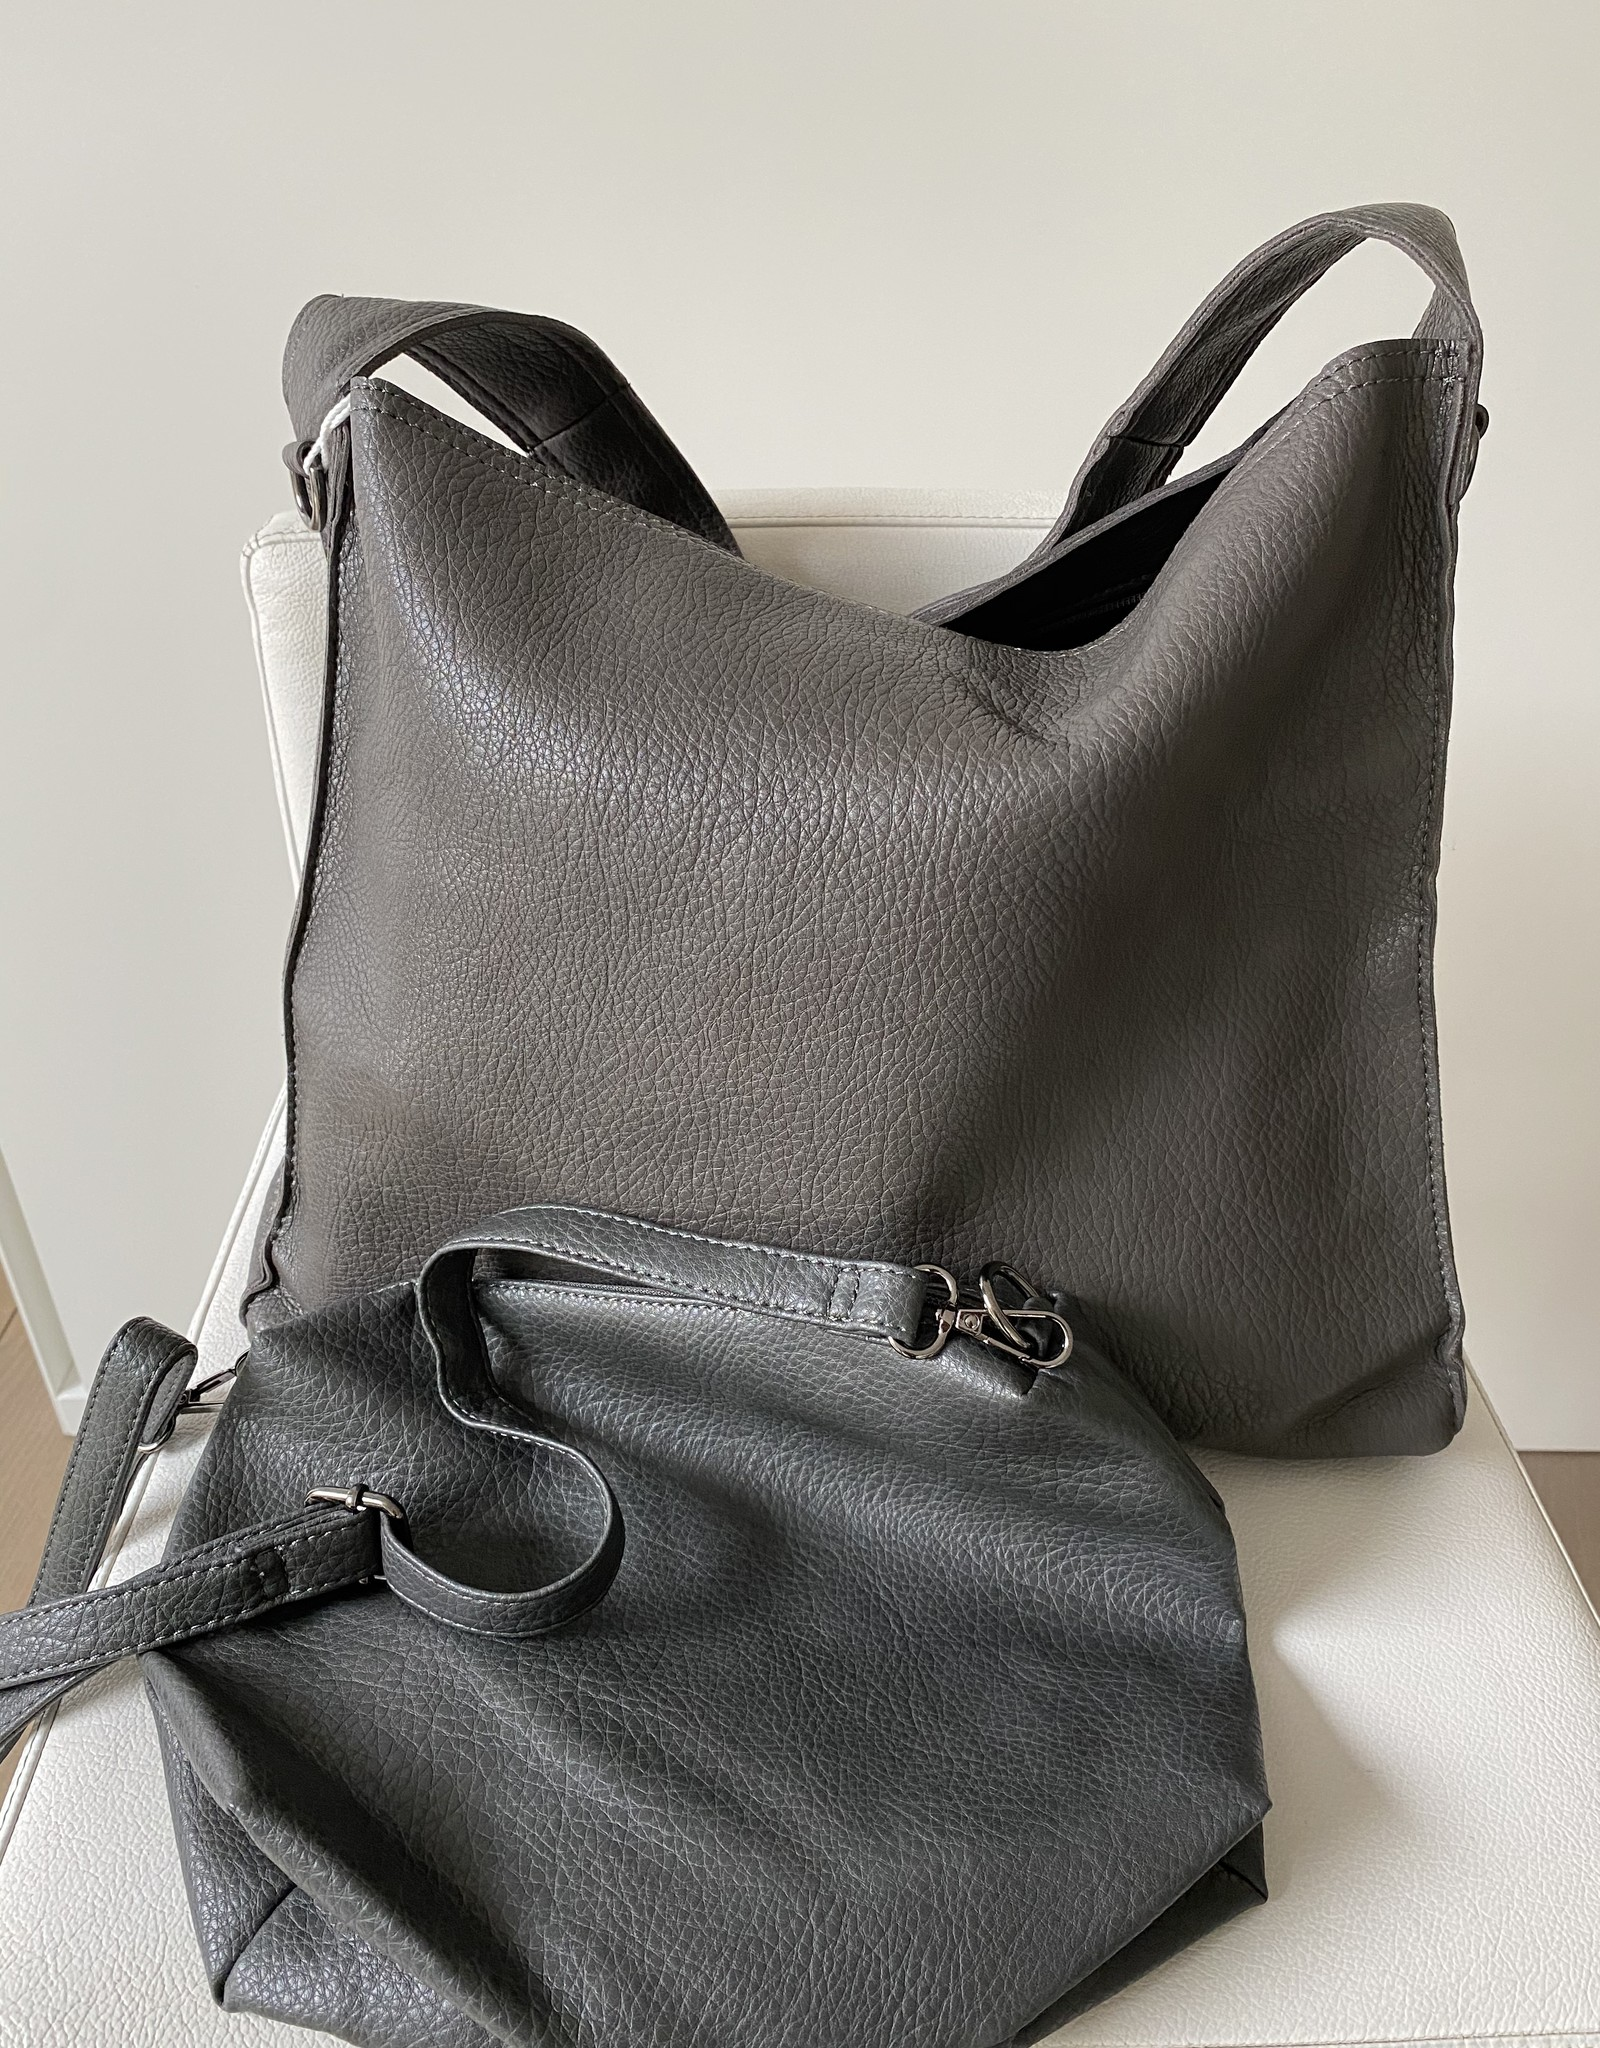 Grote tas, kunstleder met klein tasje binnenin